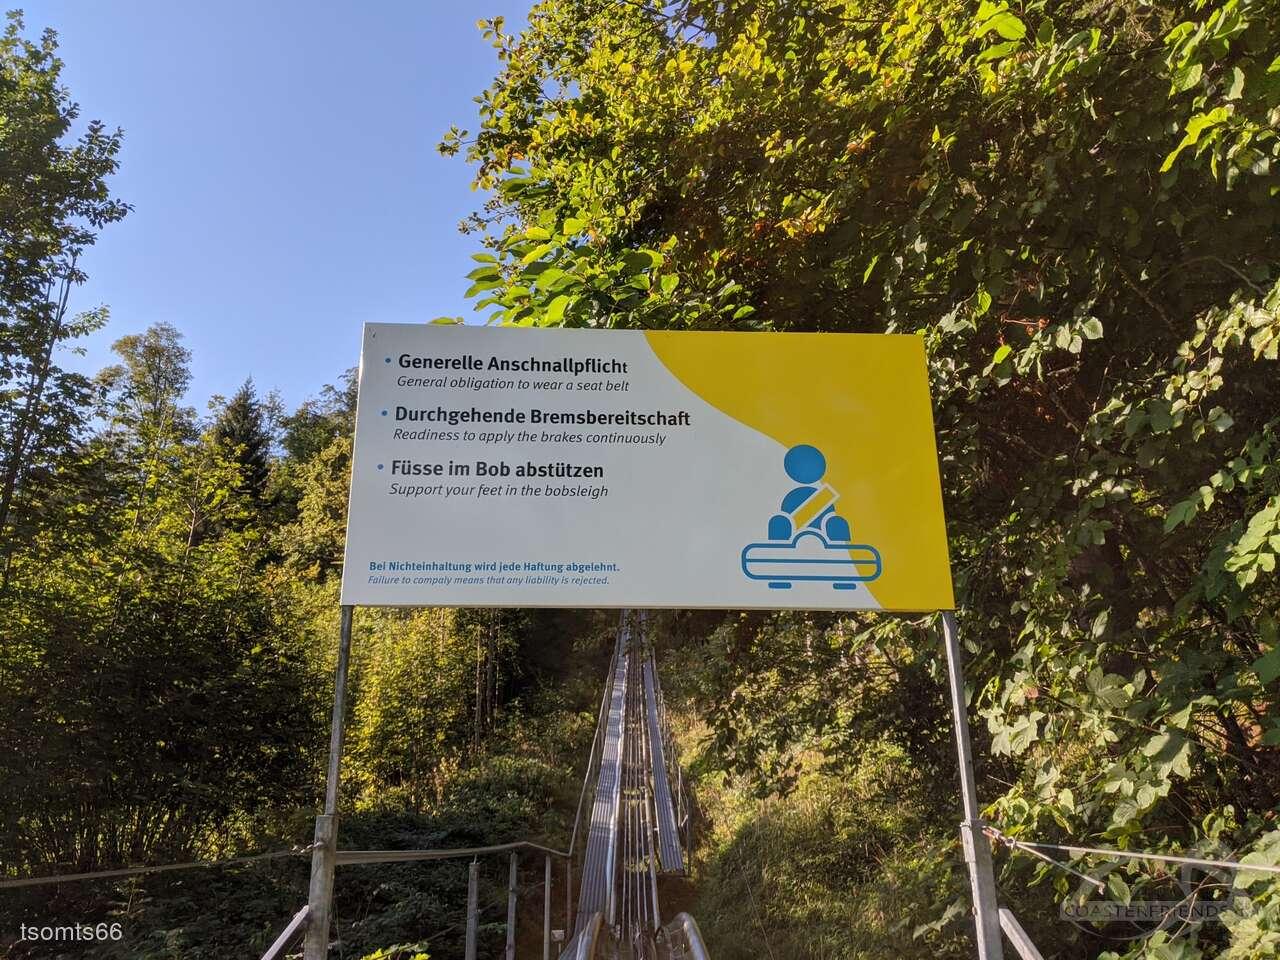 Kronberg-Bob im Park Luftseilbahn Jakobsbad-Kronberg AG Impressionen